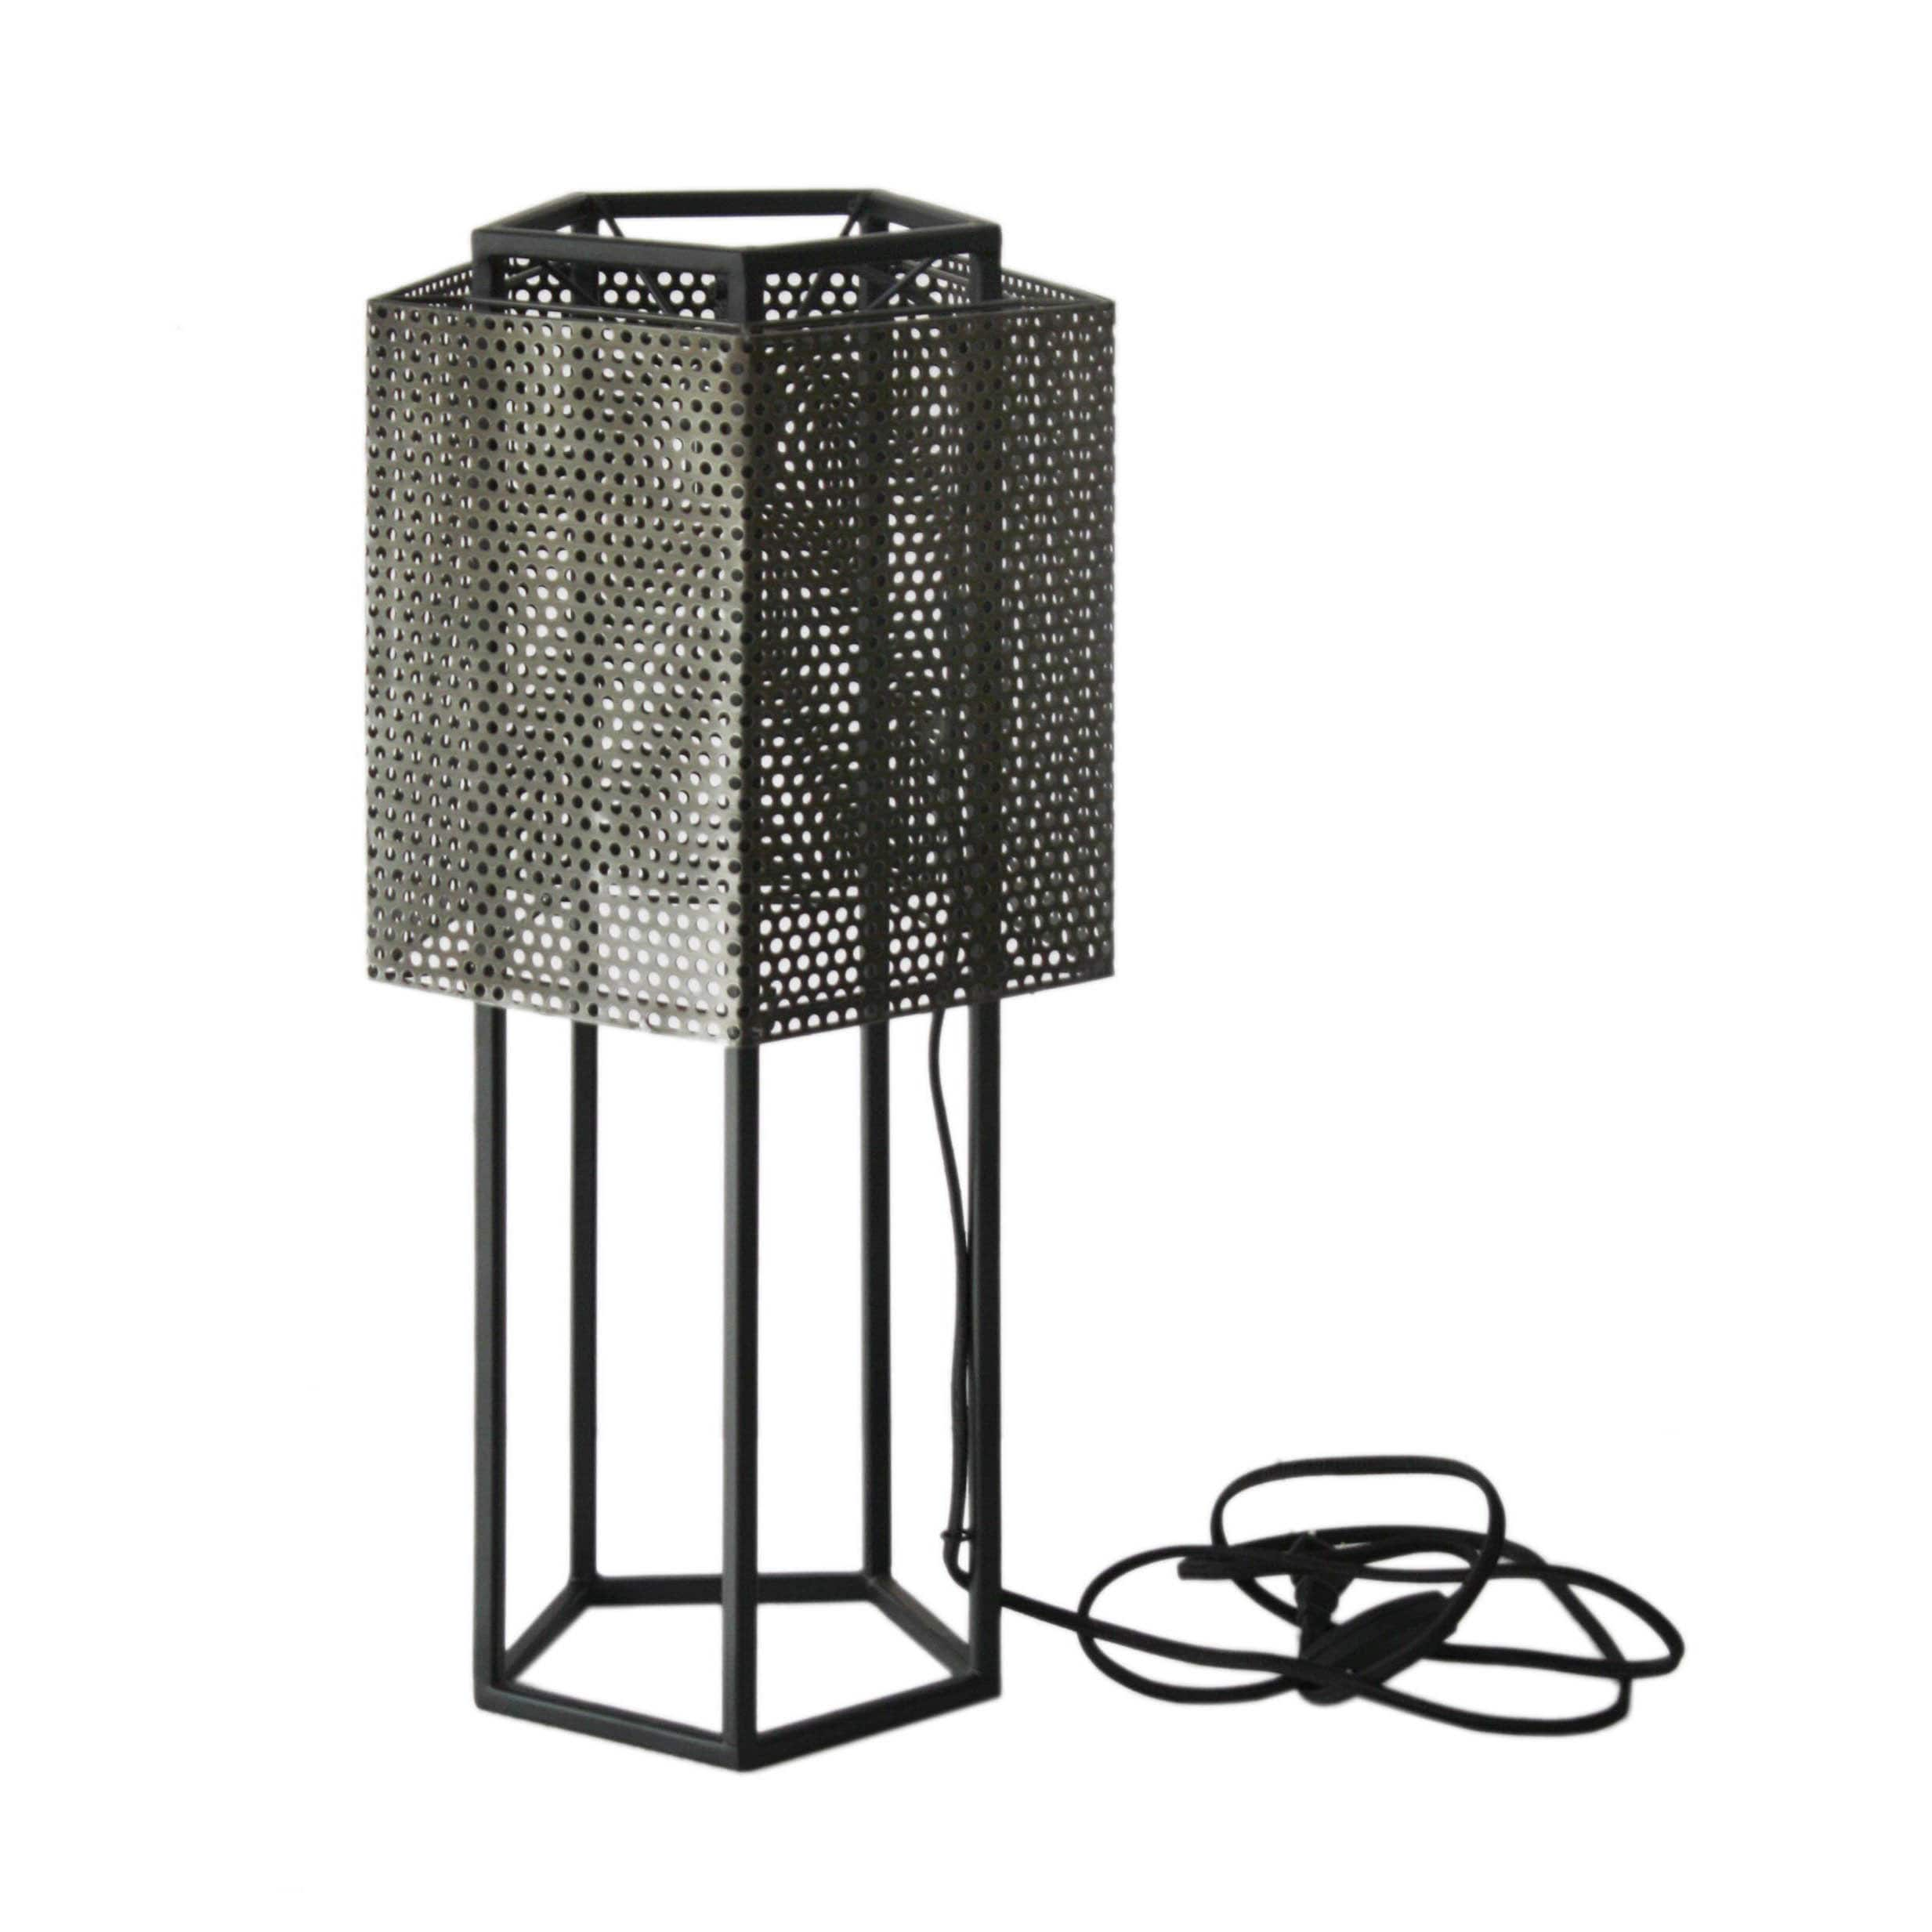 Shop aurelle home farmhouse rustic black iron table lamp on sale shop aurelle home farmhouse rustic black iron table lamp on sale free shipping today overstock 10568797 aloadofball Images